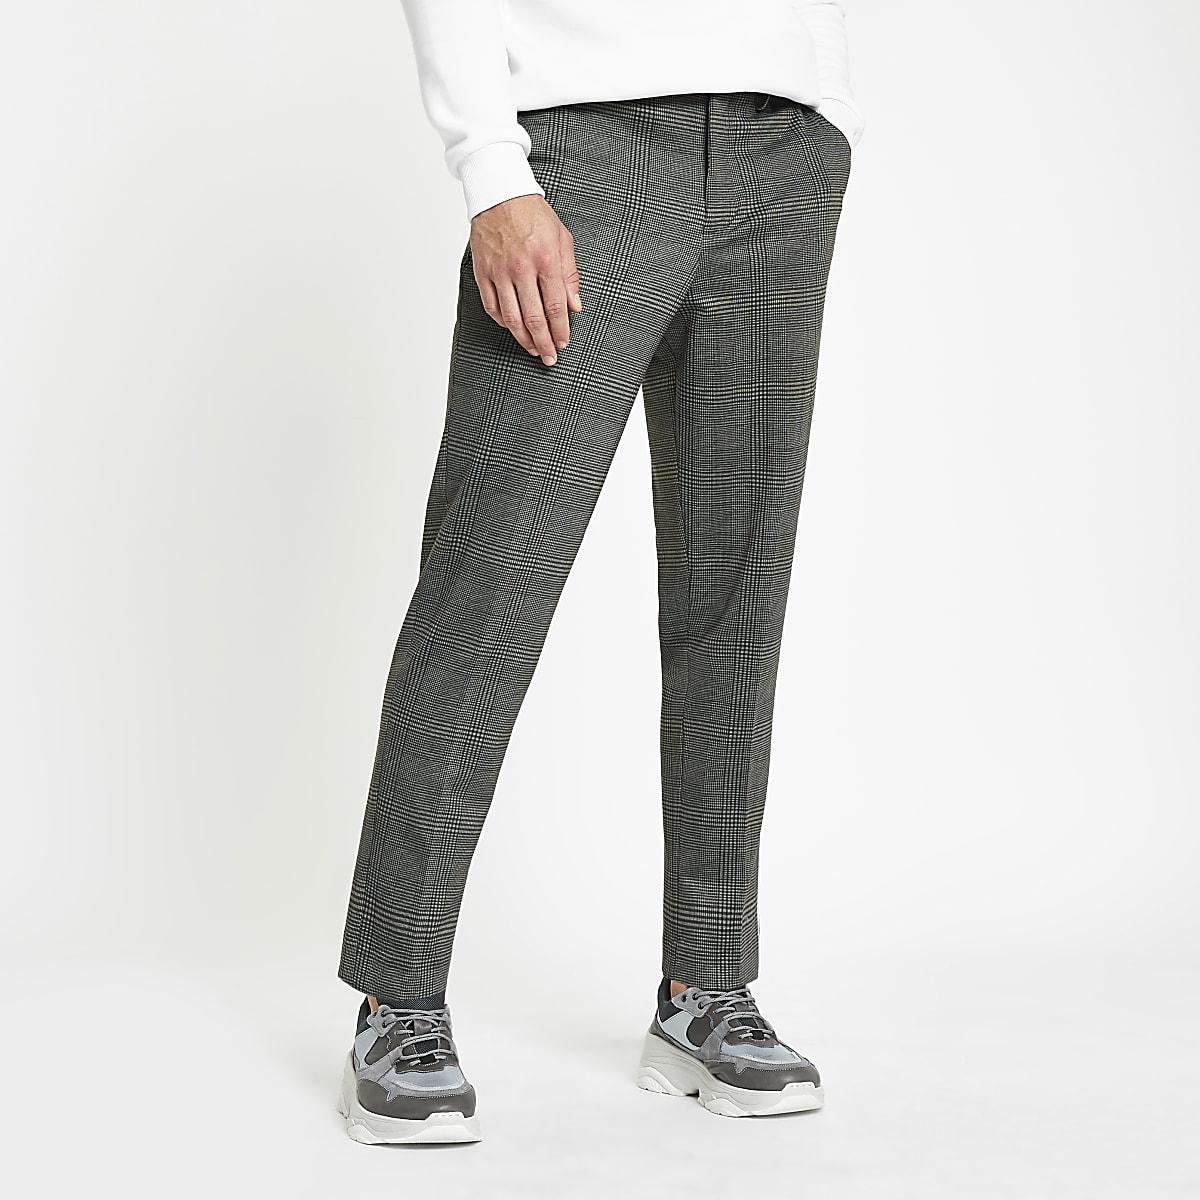 nu kopen koop online kind Selected Homme grey tapered crop trousers